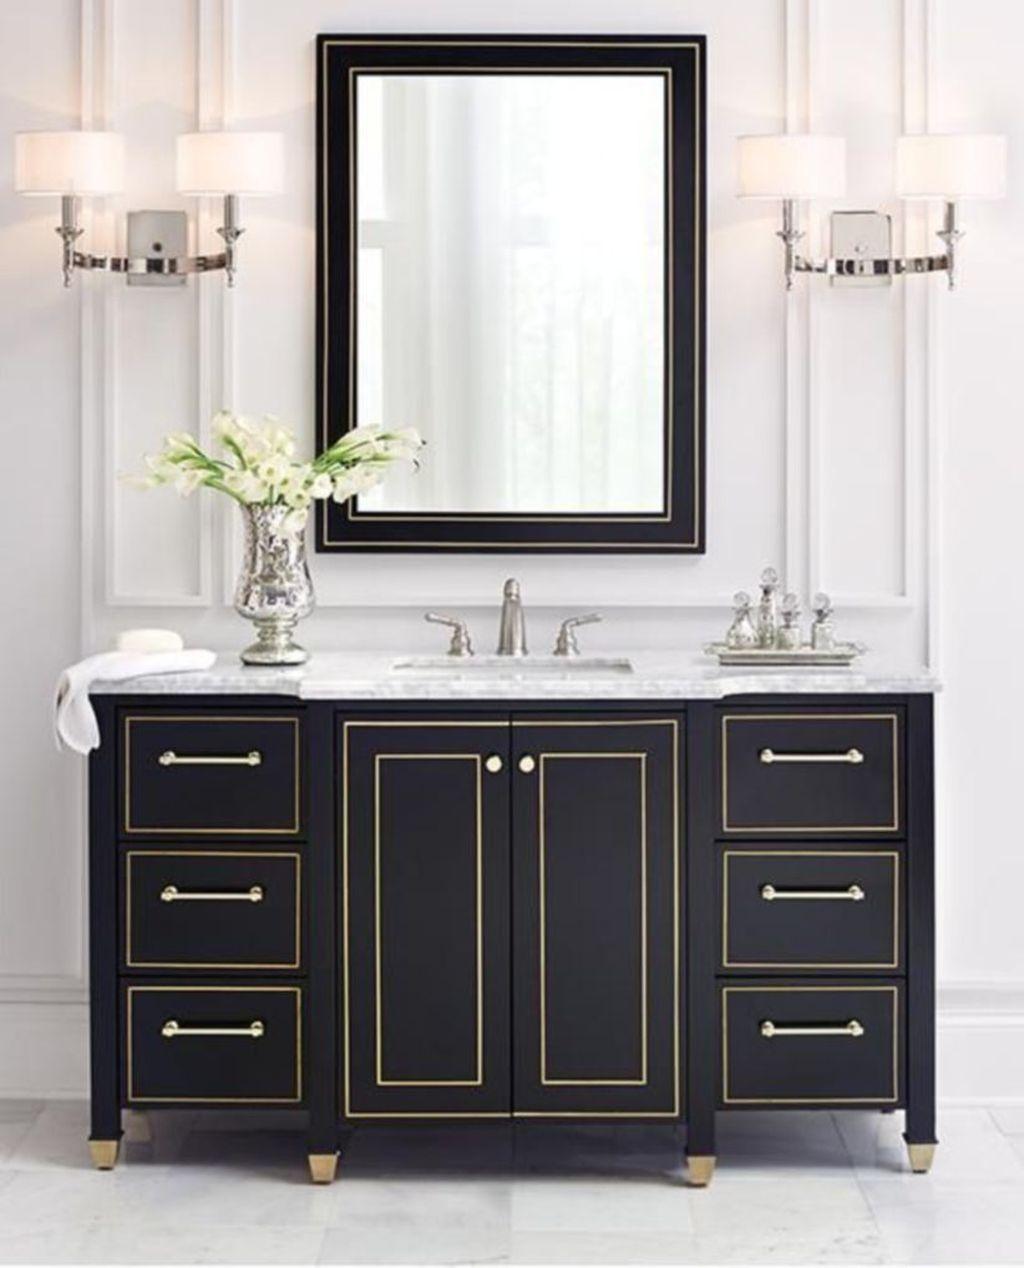 44 Classy Black Bathroom Cabinets Black Vanity Bathroom Black Cabinets Bathroom Black Bathroom